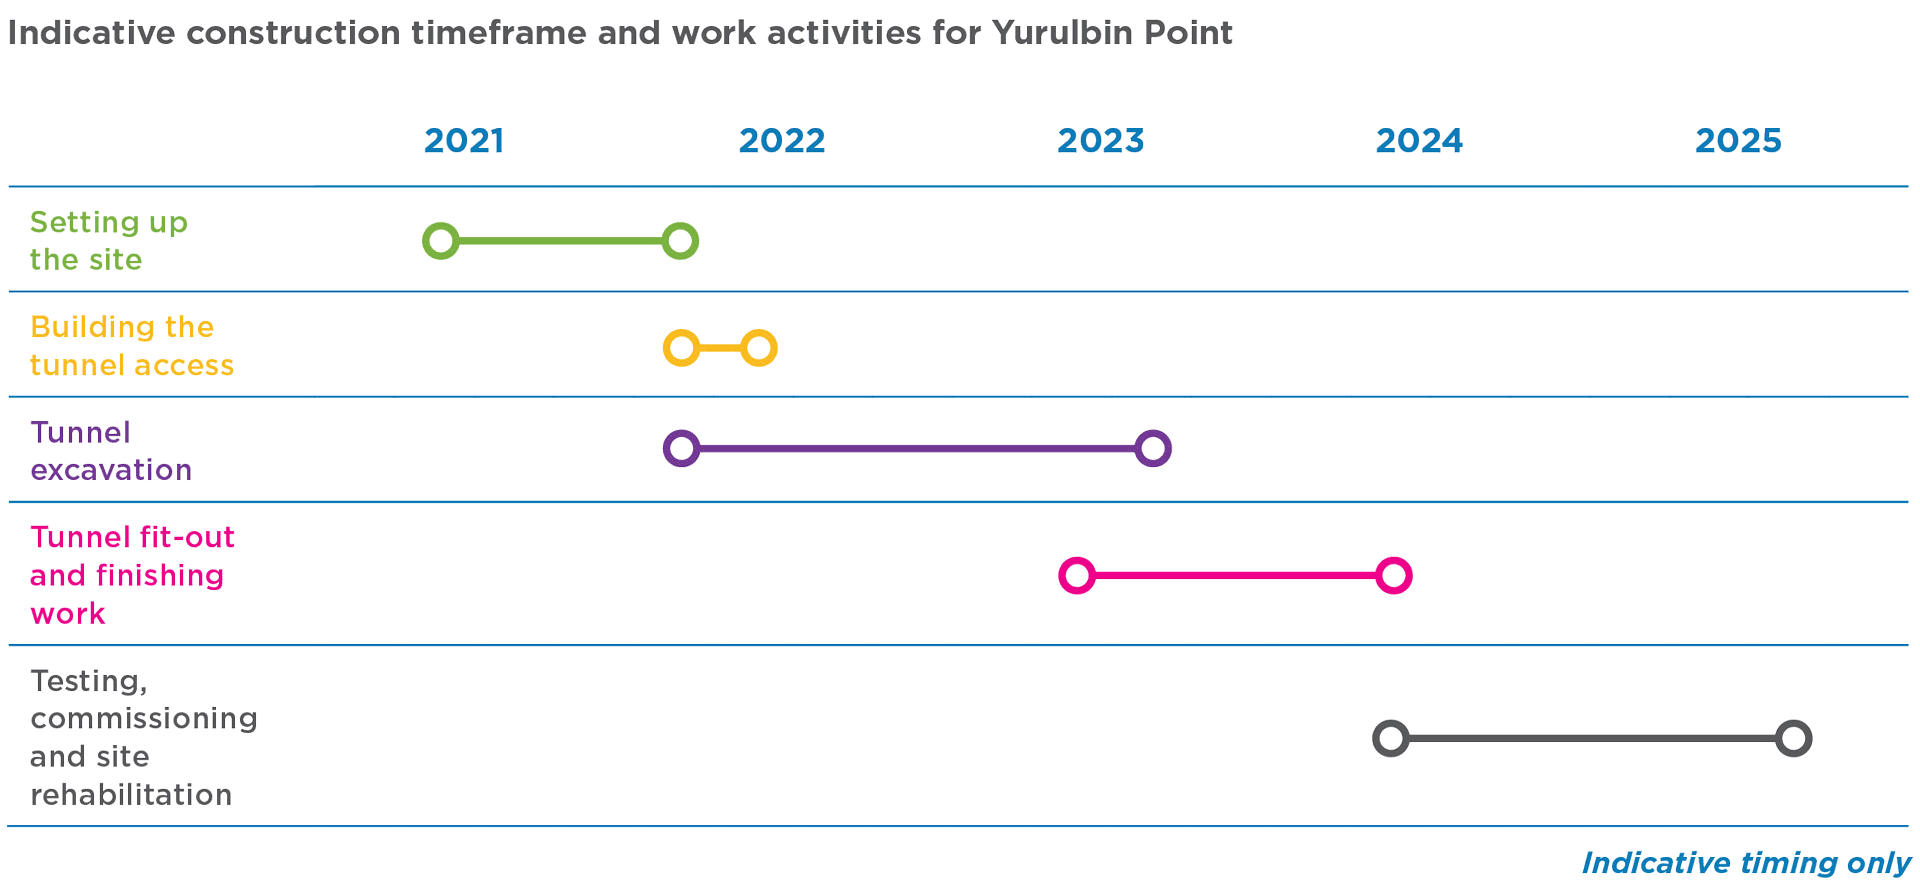 Yurulbin Point construction site timeline